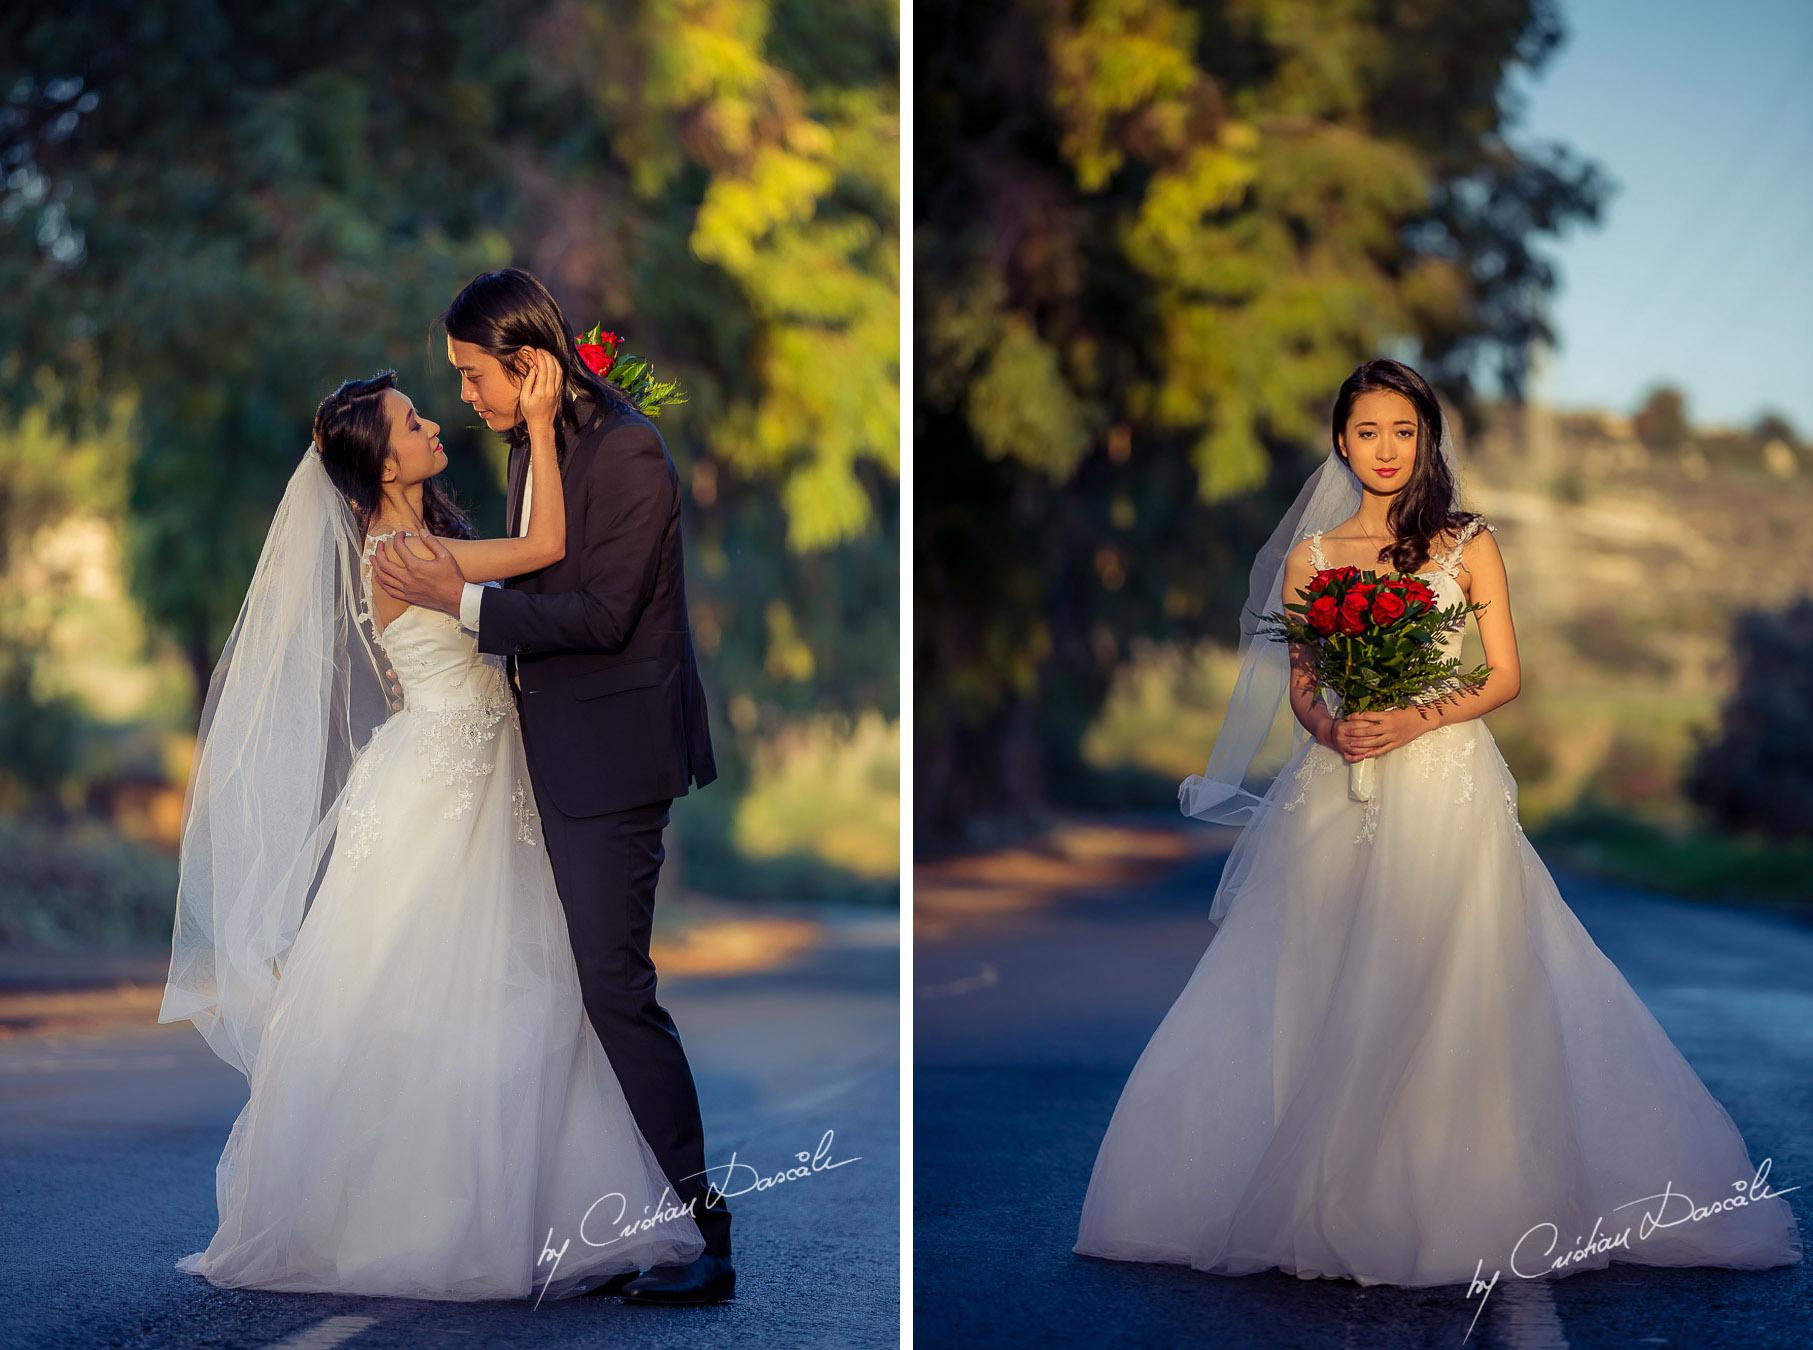 Pre Wedding Photoshoot in Cyprus - 09